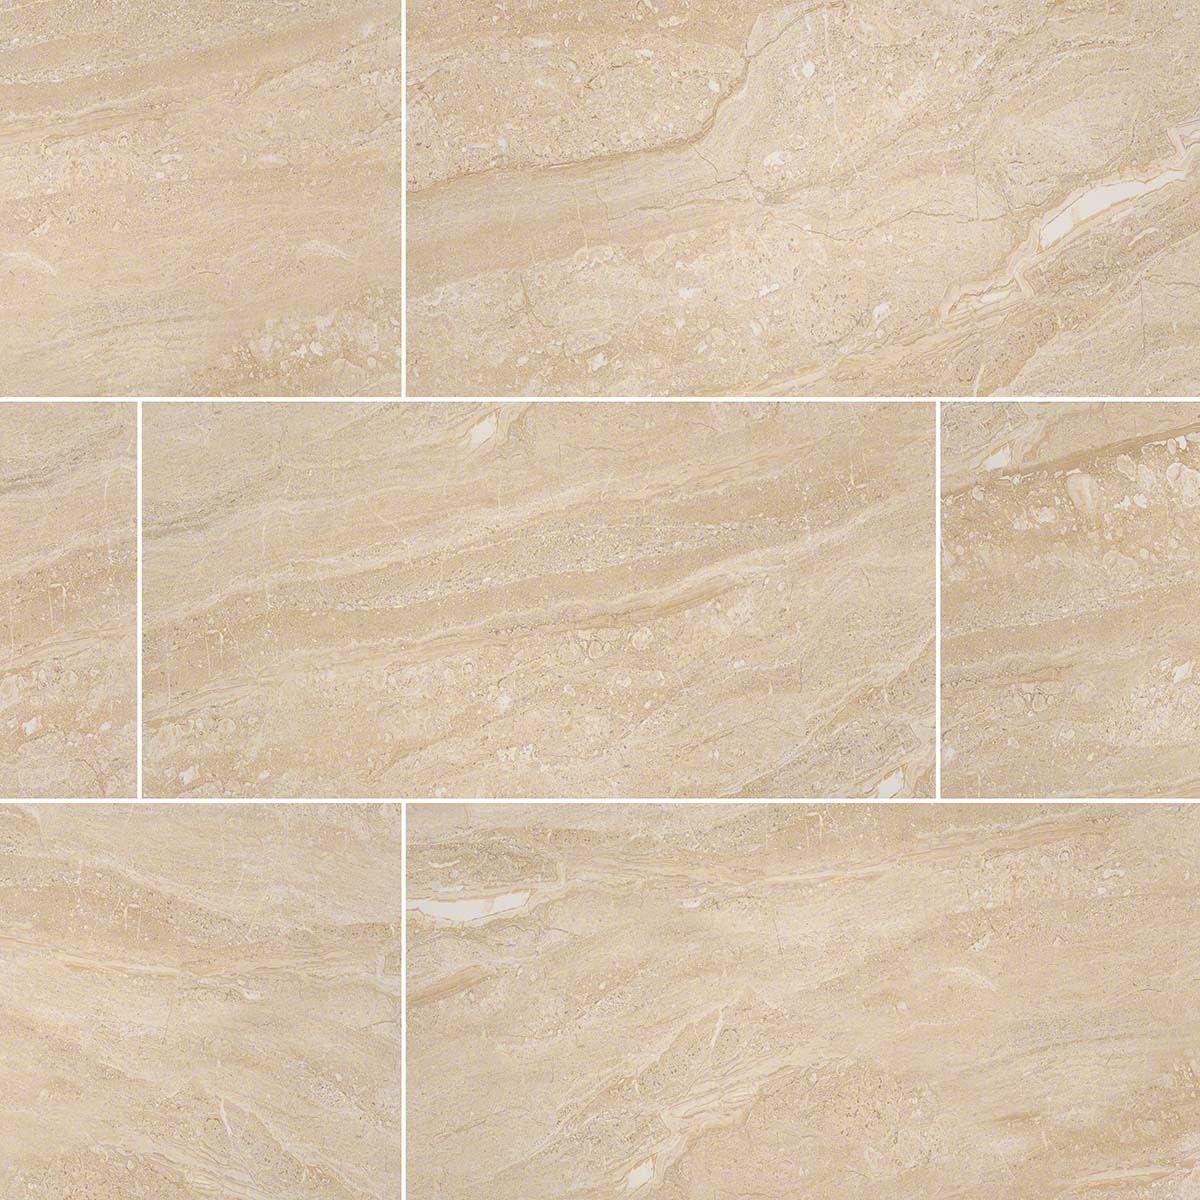 Alya tile 24x24 polish beige marble look porcelain tile alya alya tile 24x24 polish beige marble look porcelain tile doublecrazyfo Images